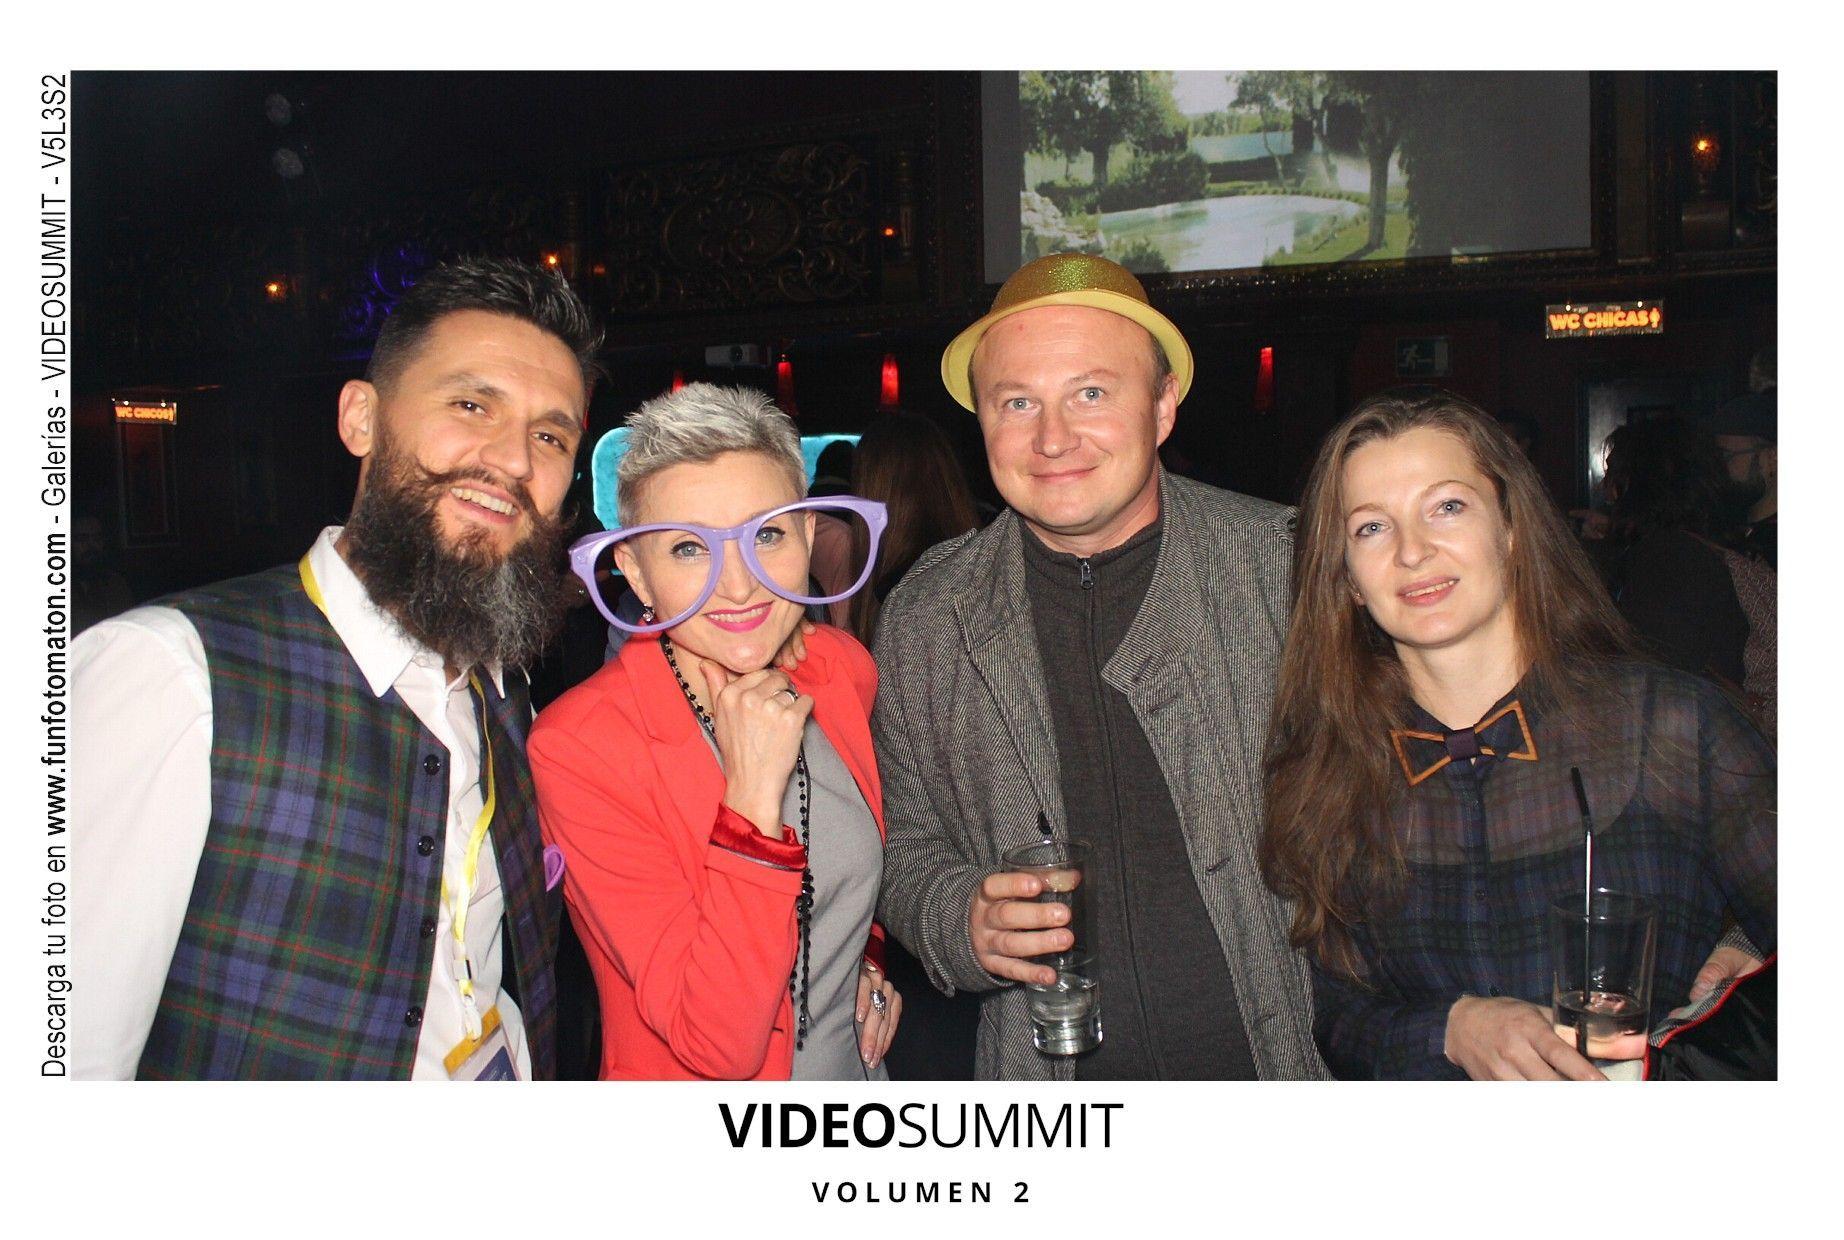 videosummit-vol2-club-party-009